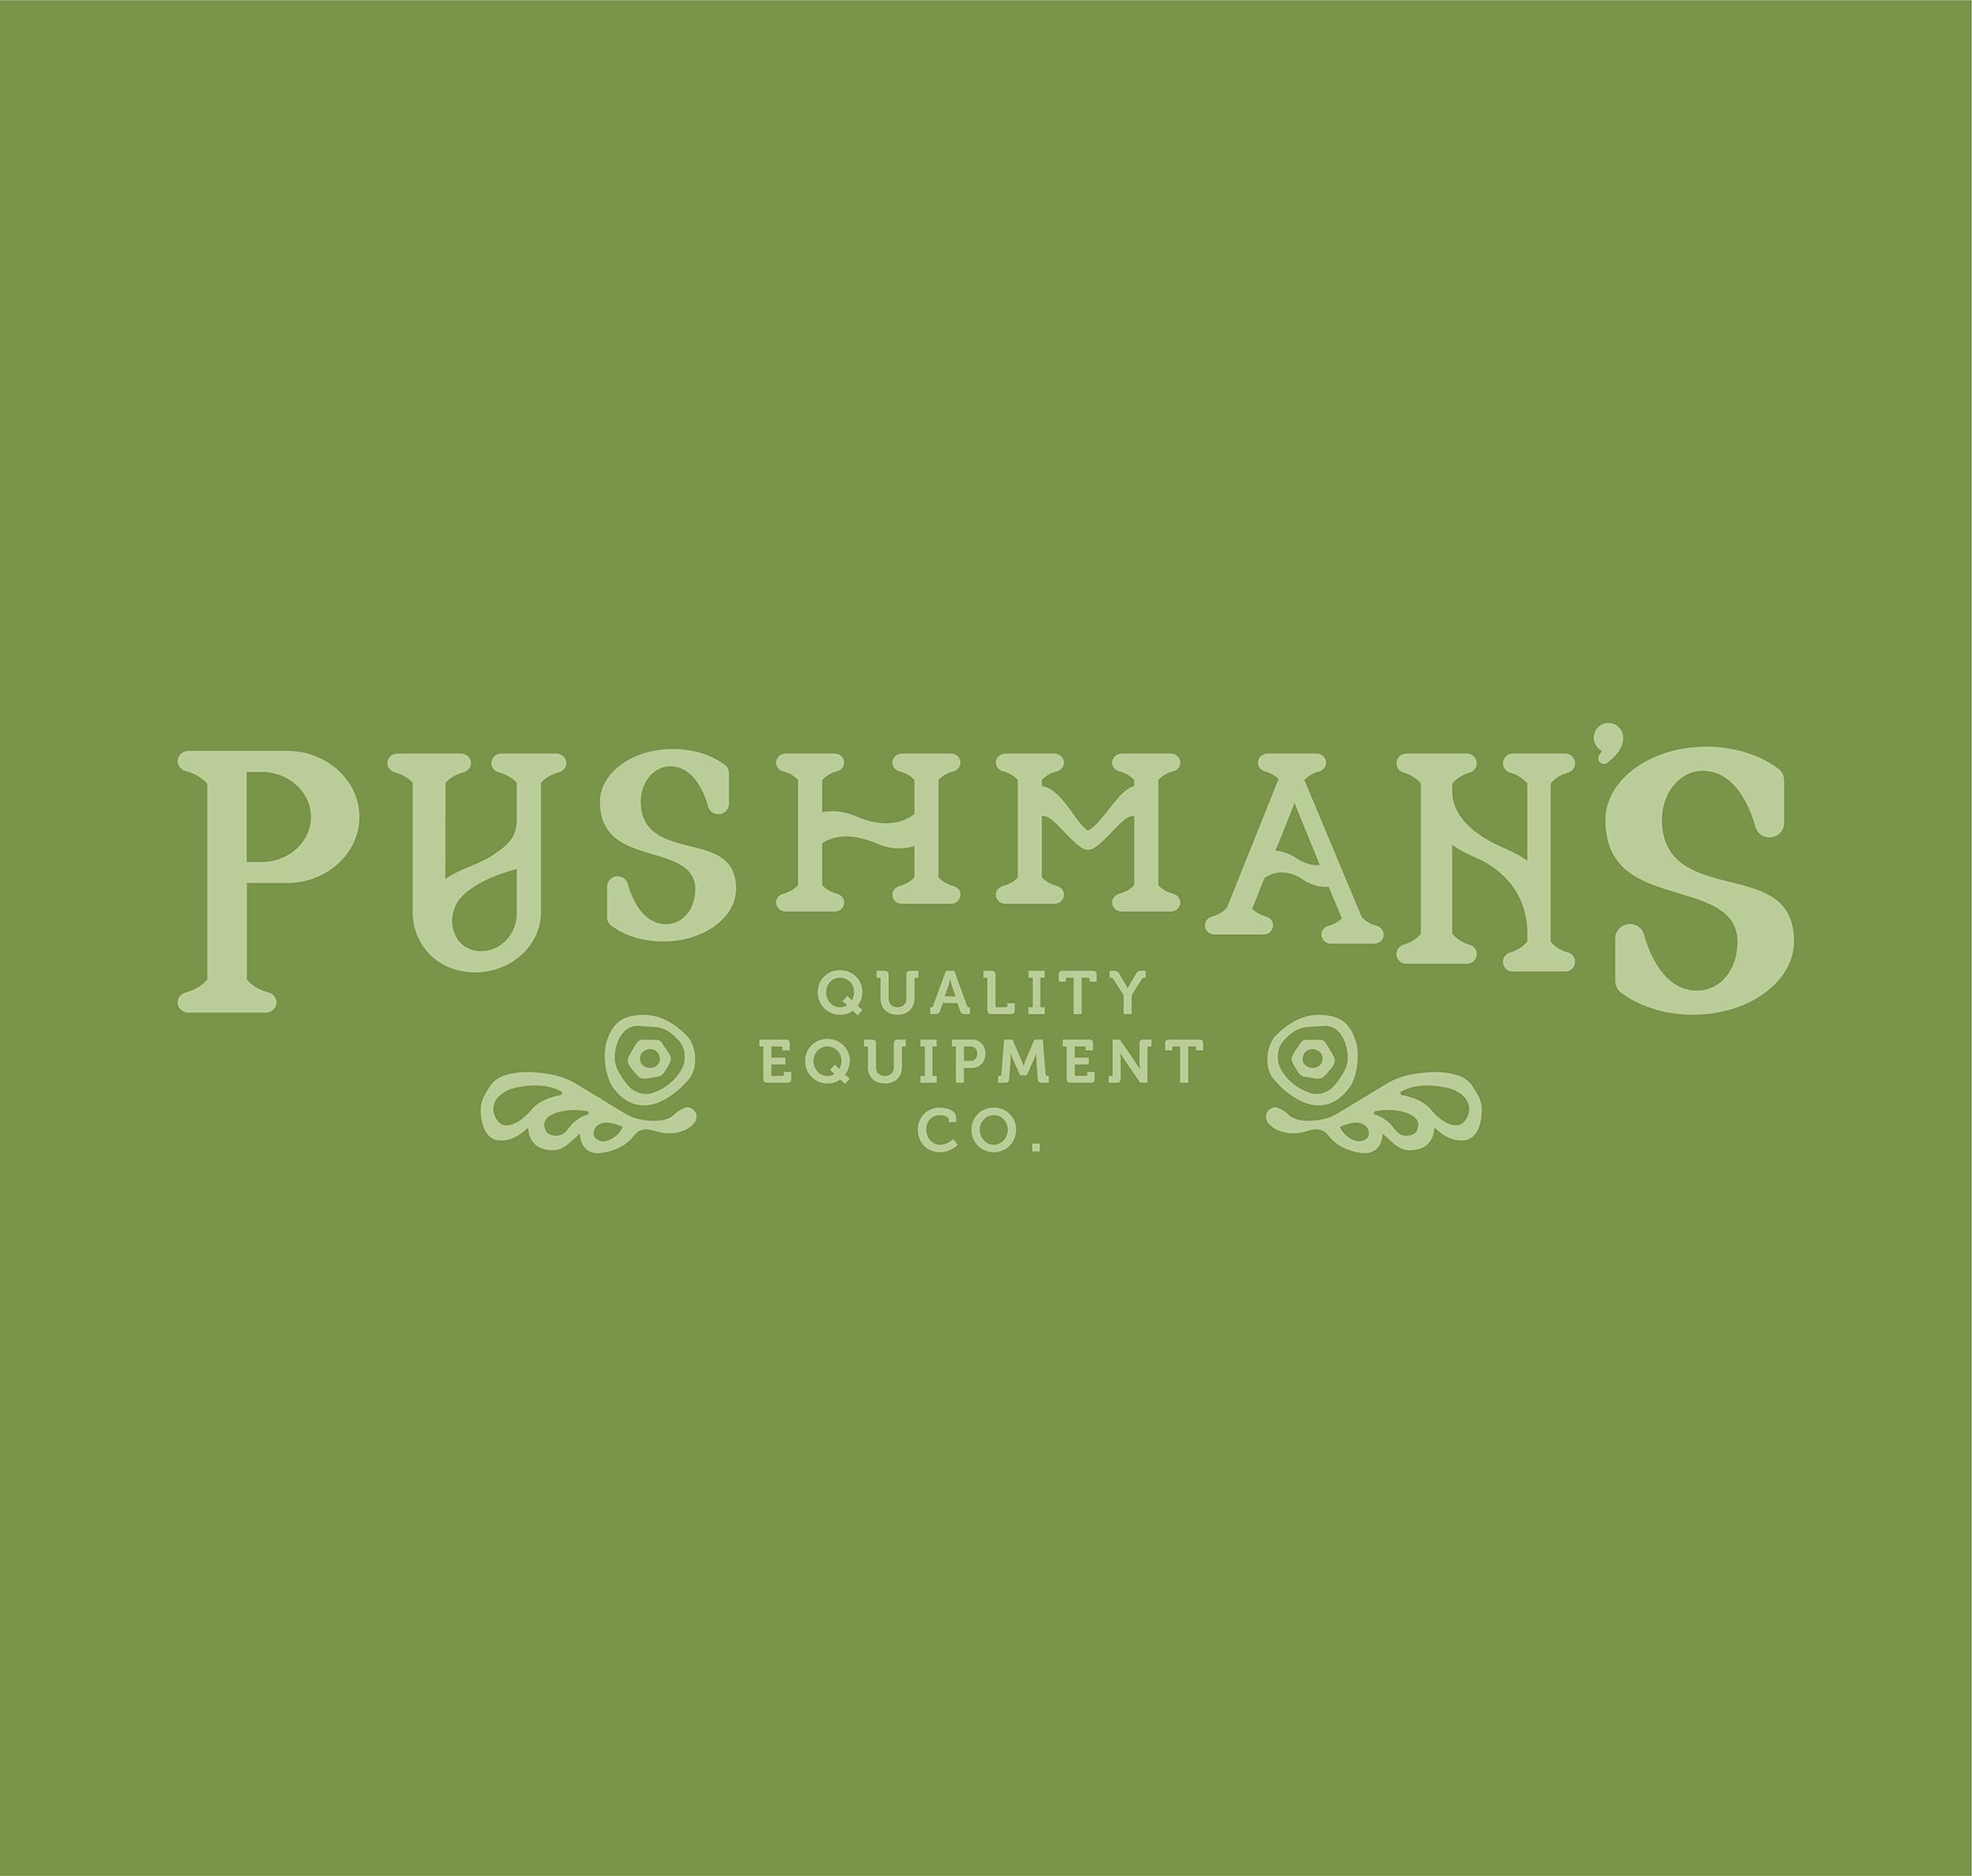 pushman_green-24.jpg